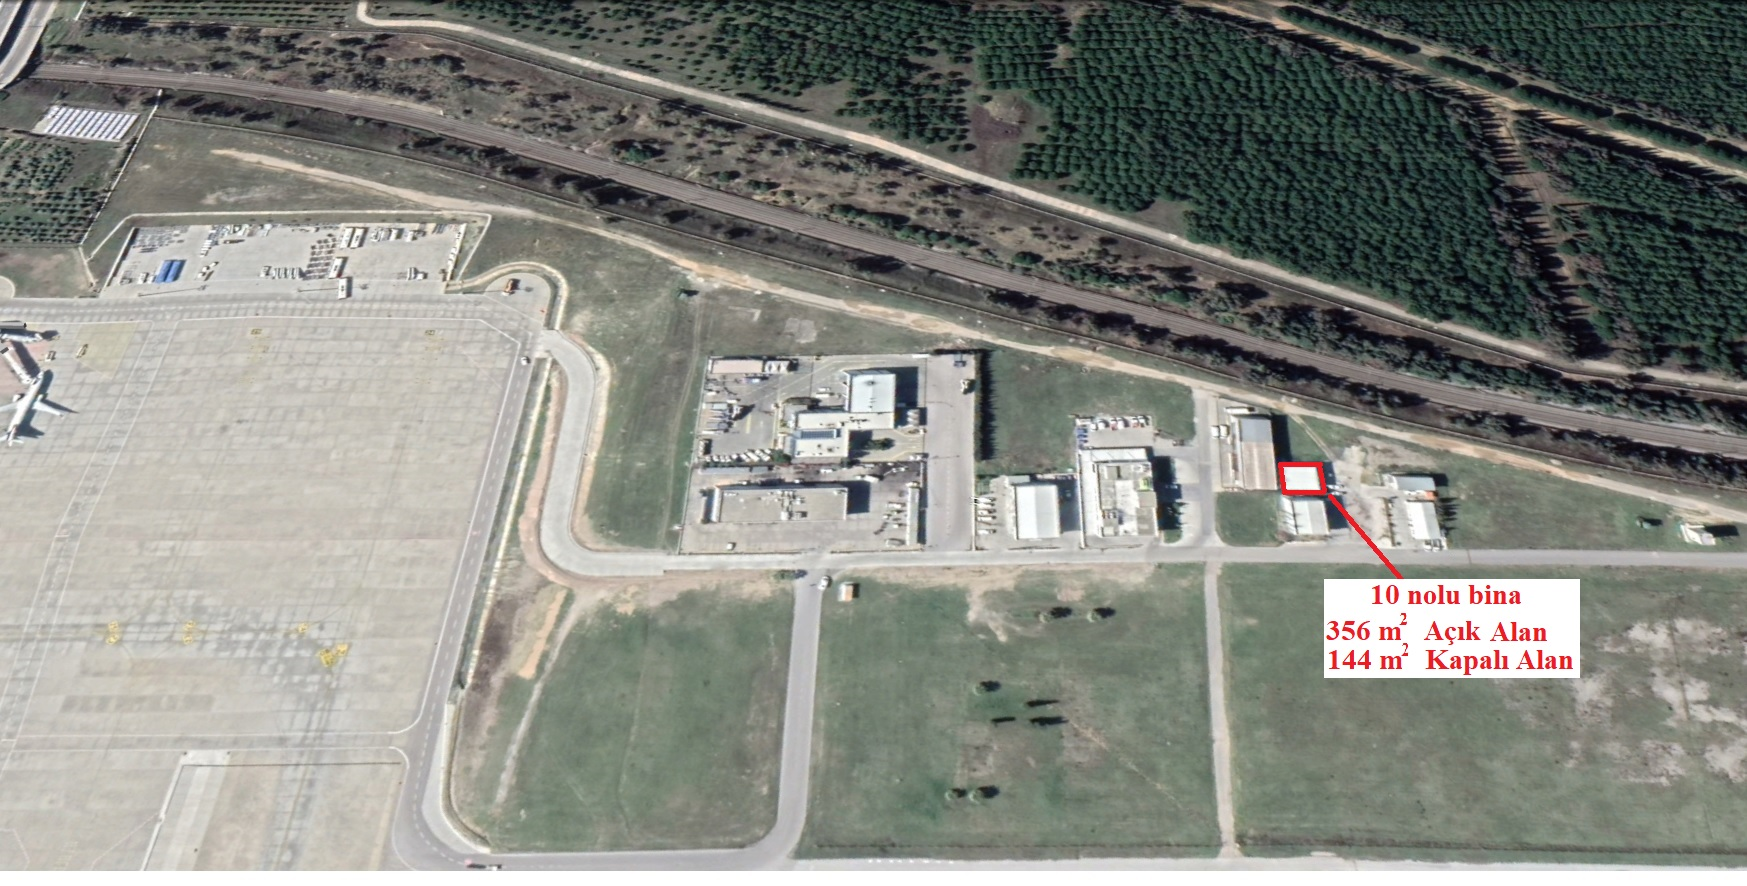 Boş bina 10 nolu parsel 356 m2 açık 144 m2 kapalı alan.jpg